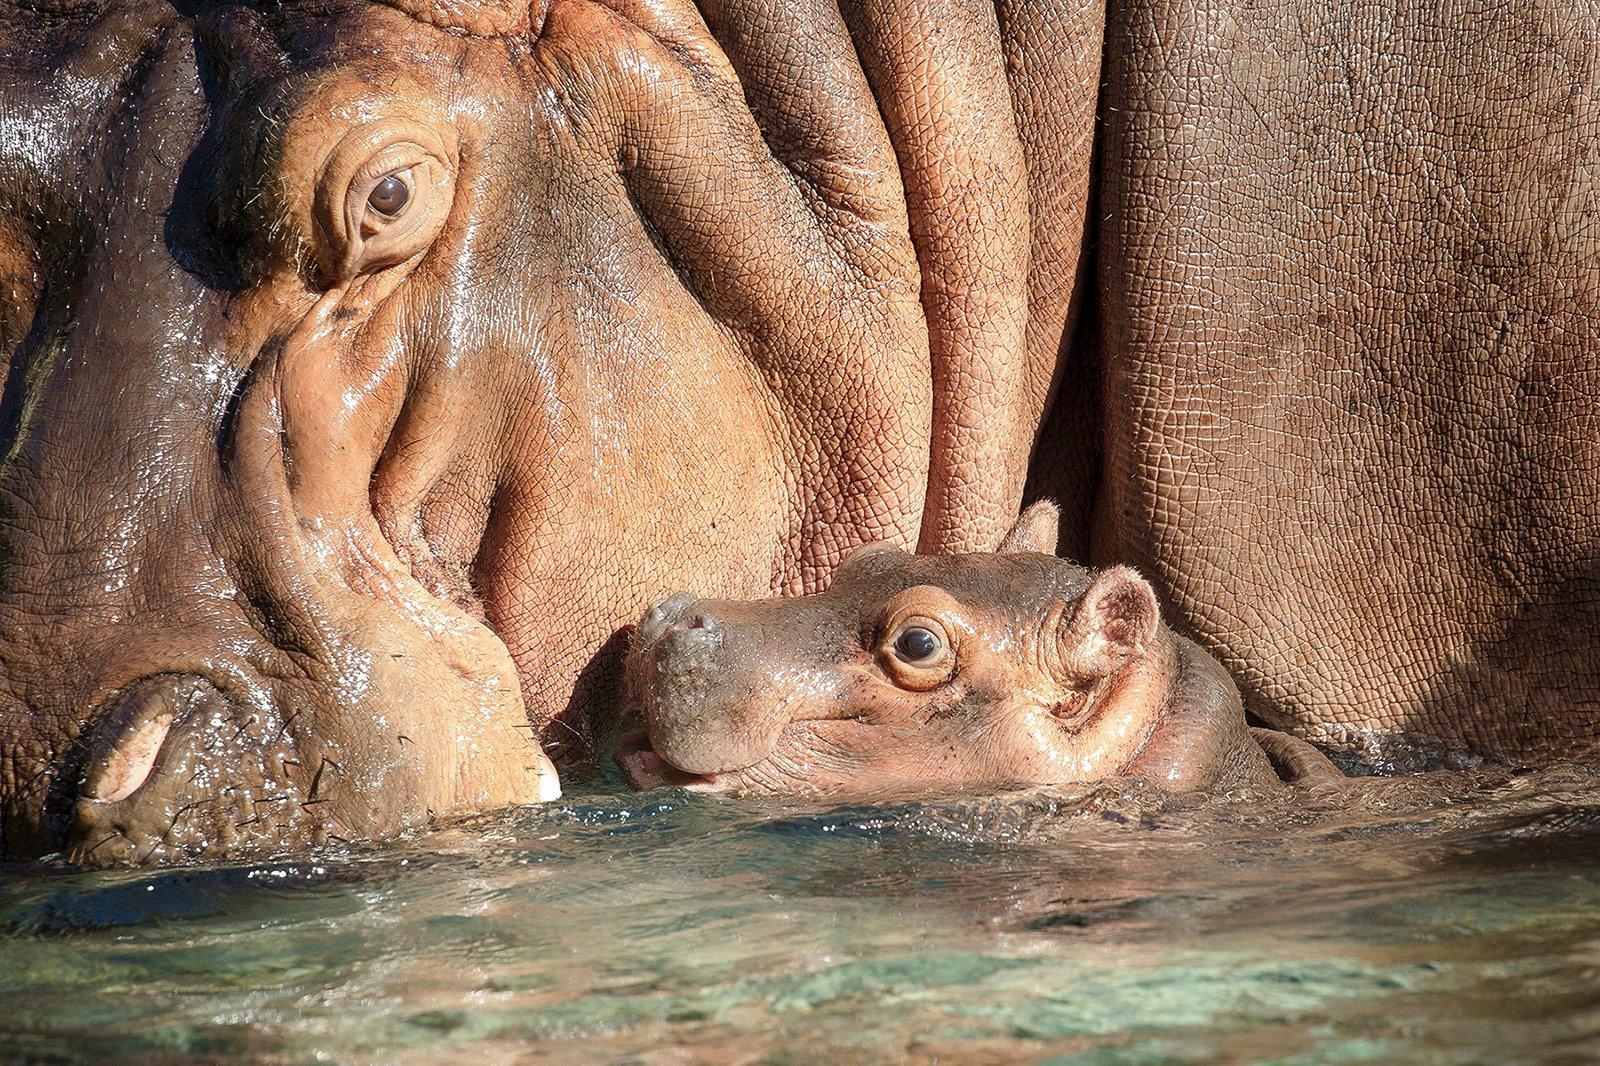 San Diego Zoo welcomes baby river hippopotamus